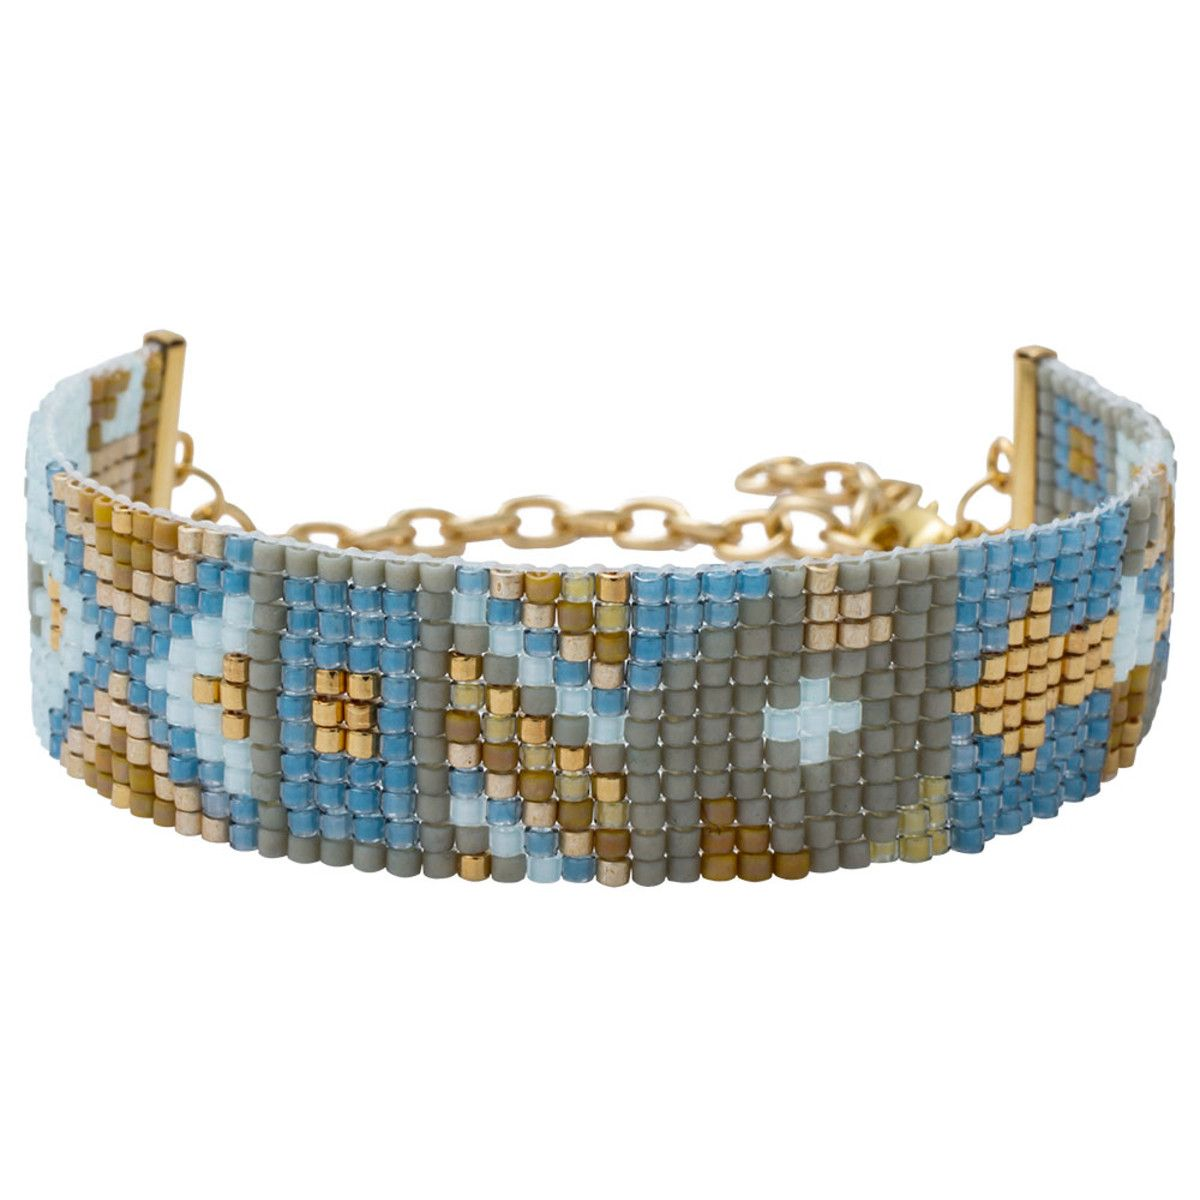 ProjectJewelry Inspiration Projet Design Gilded Bracelet Patchwork kiuXZwOlPT